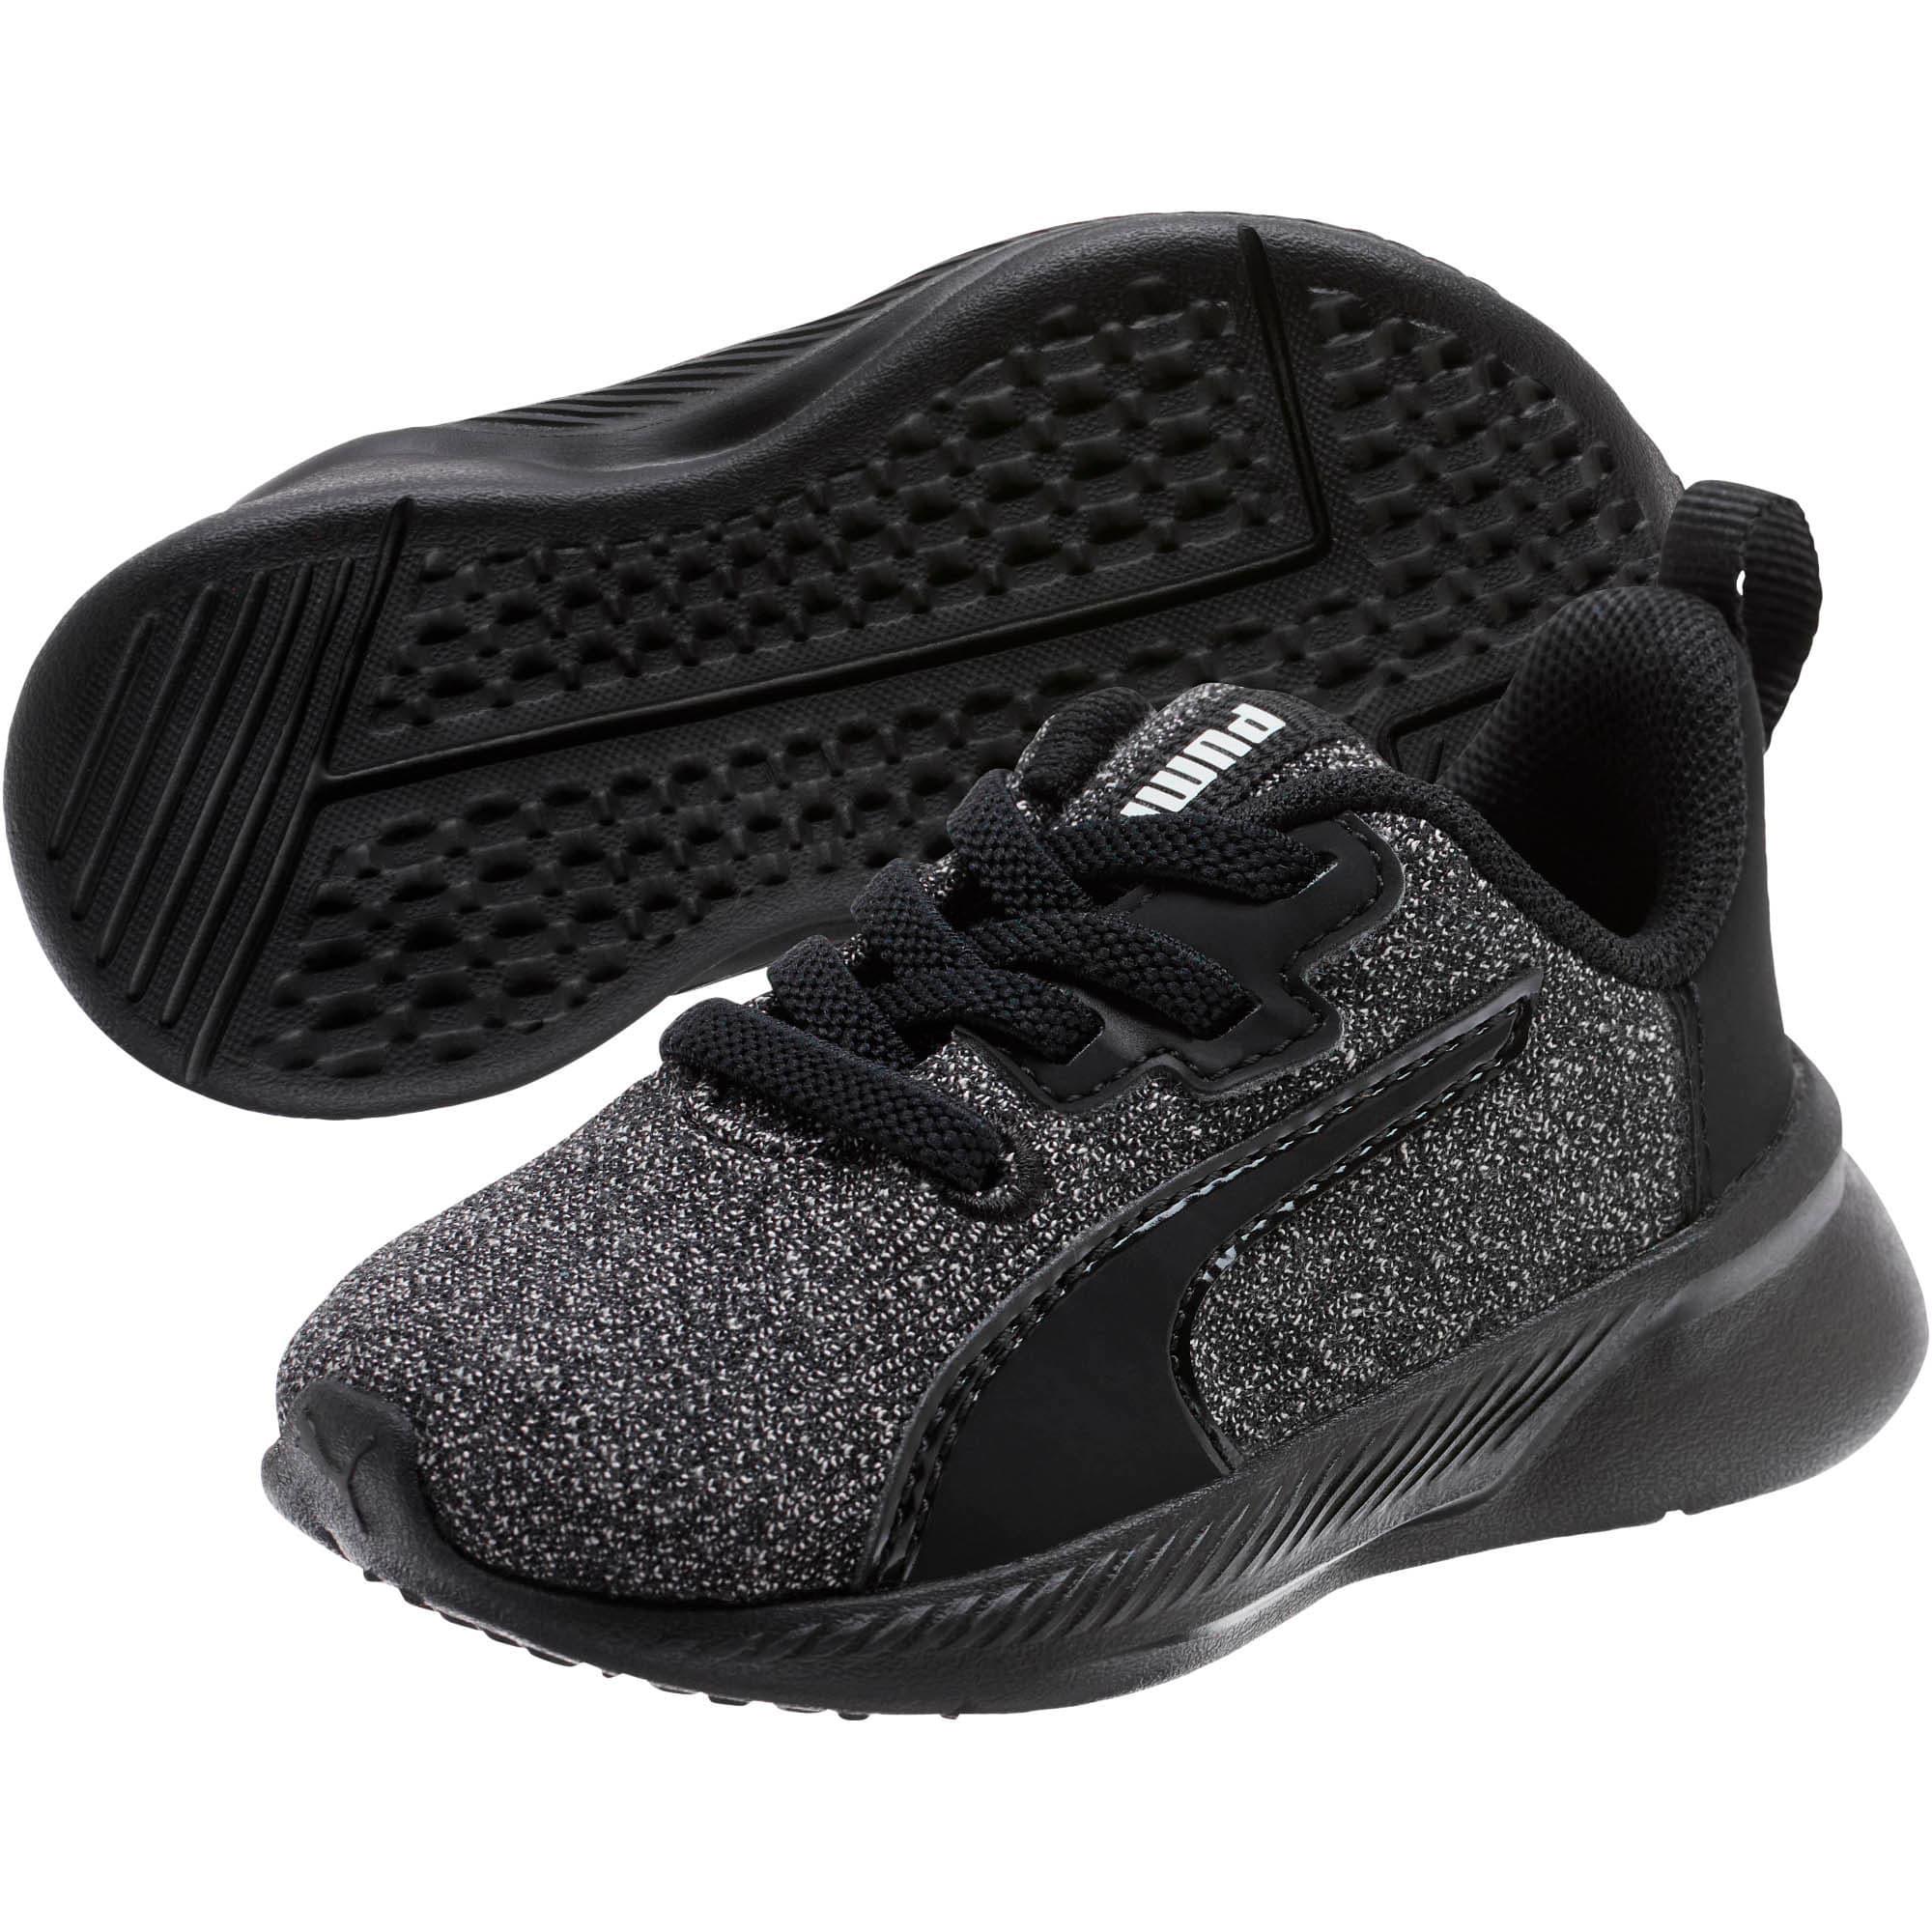 Thumbnail 2 of Tishatsu Runner Knit Toddler Shoes, Puma Black-Puma White, medium